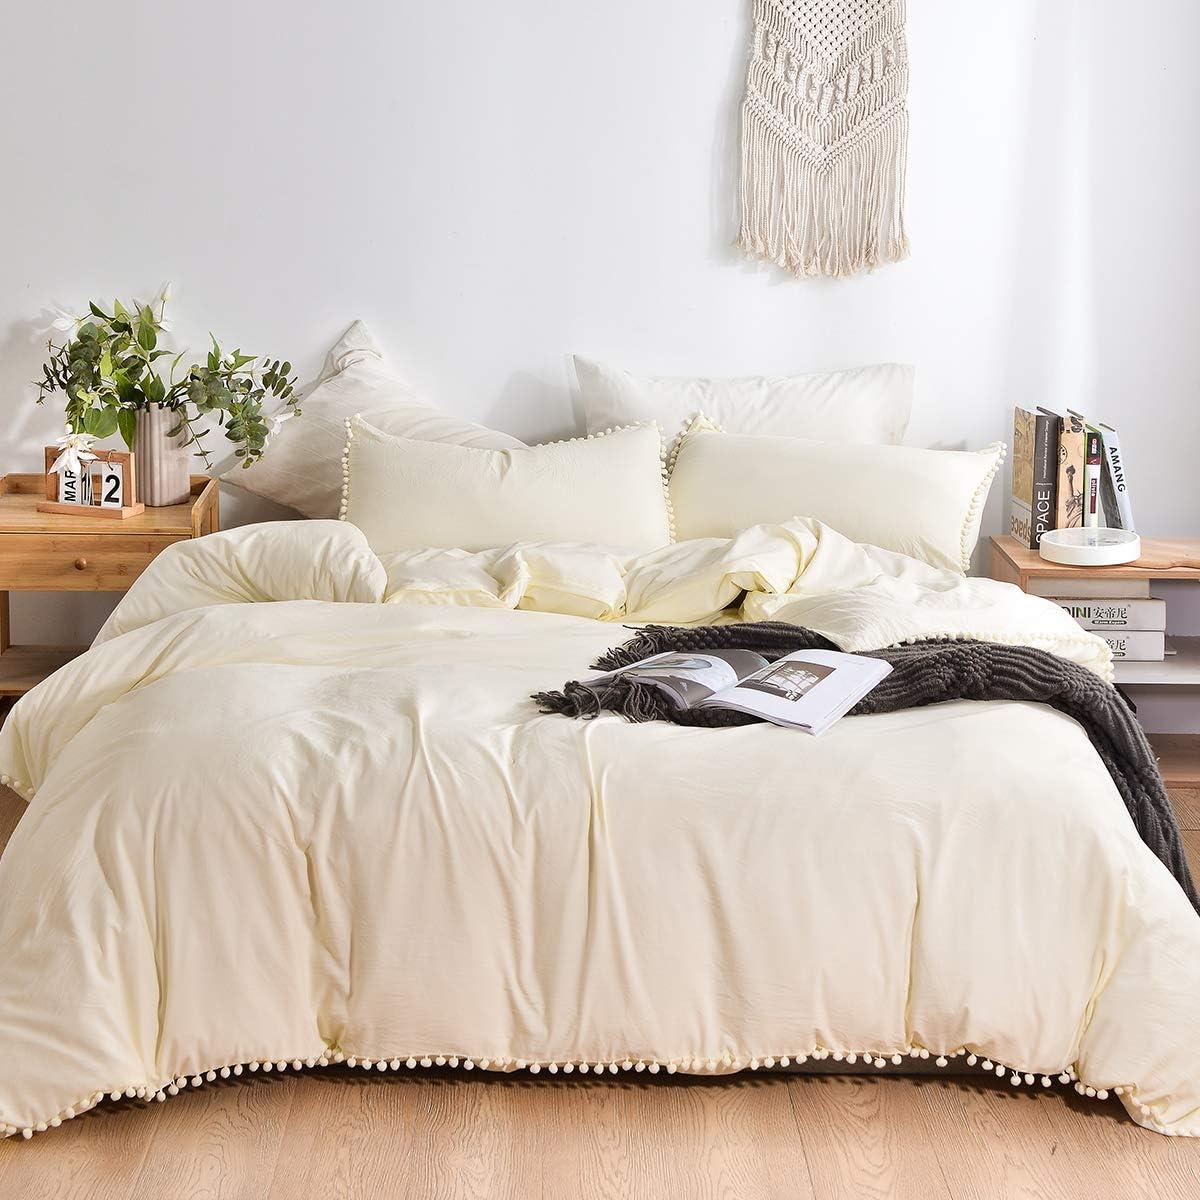 3 Pcs Set Duvet Cover Pillowcase Cotton Balls Simple Home Decor Twin Queen King